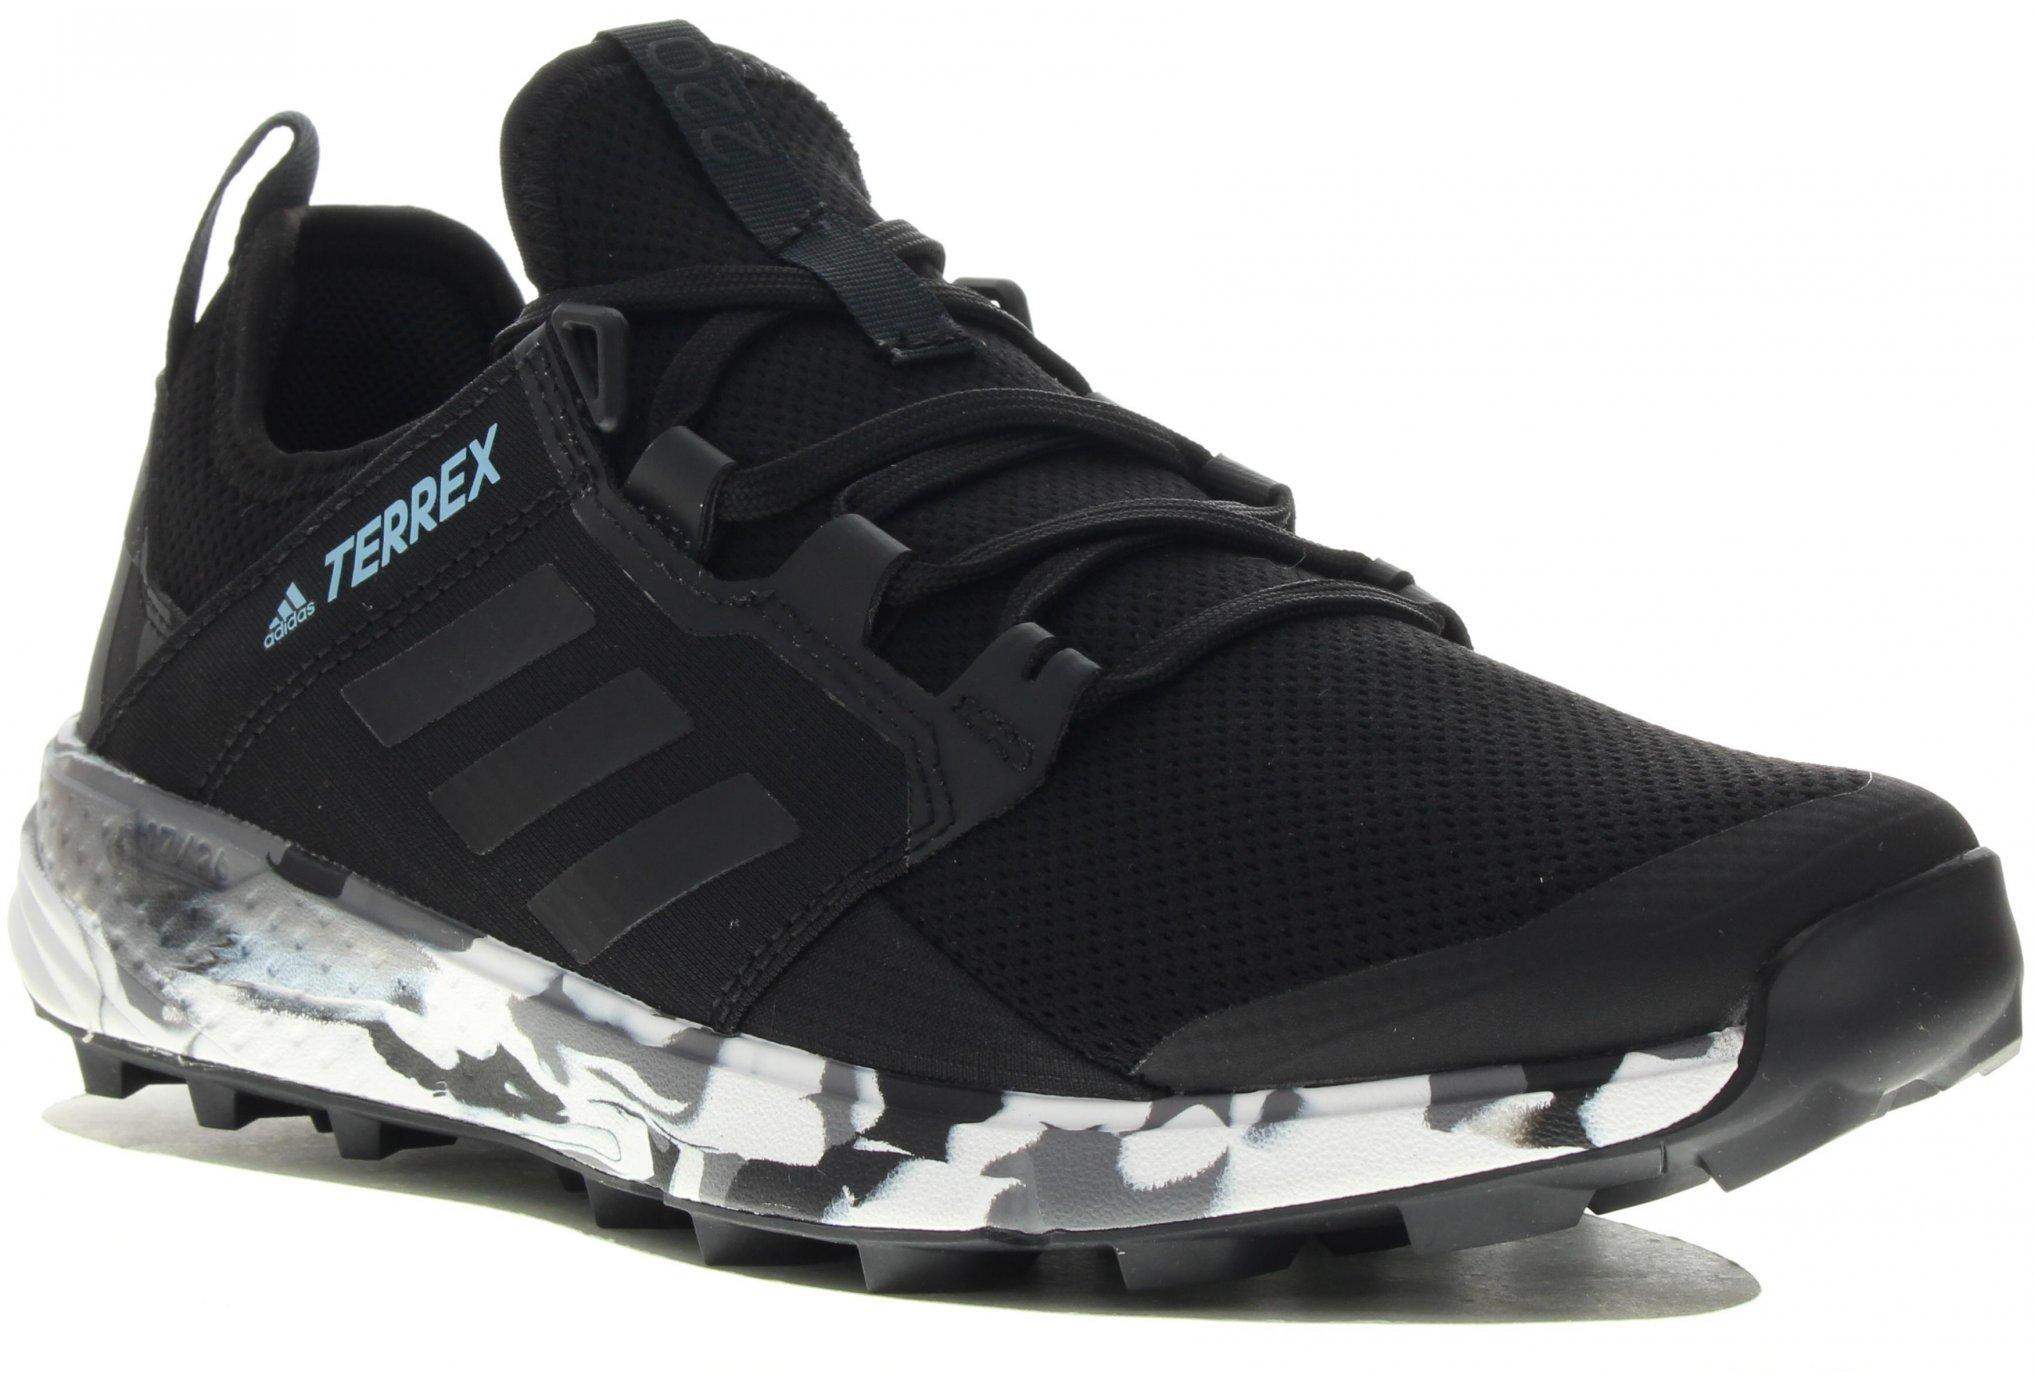 Adidas Terrex speed ld w chaussures running femme